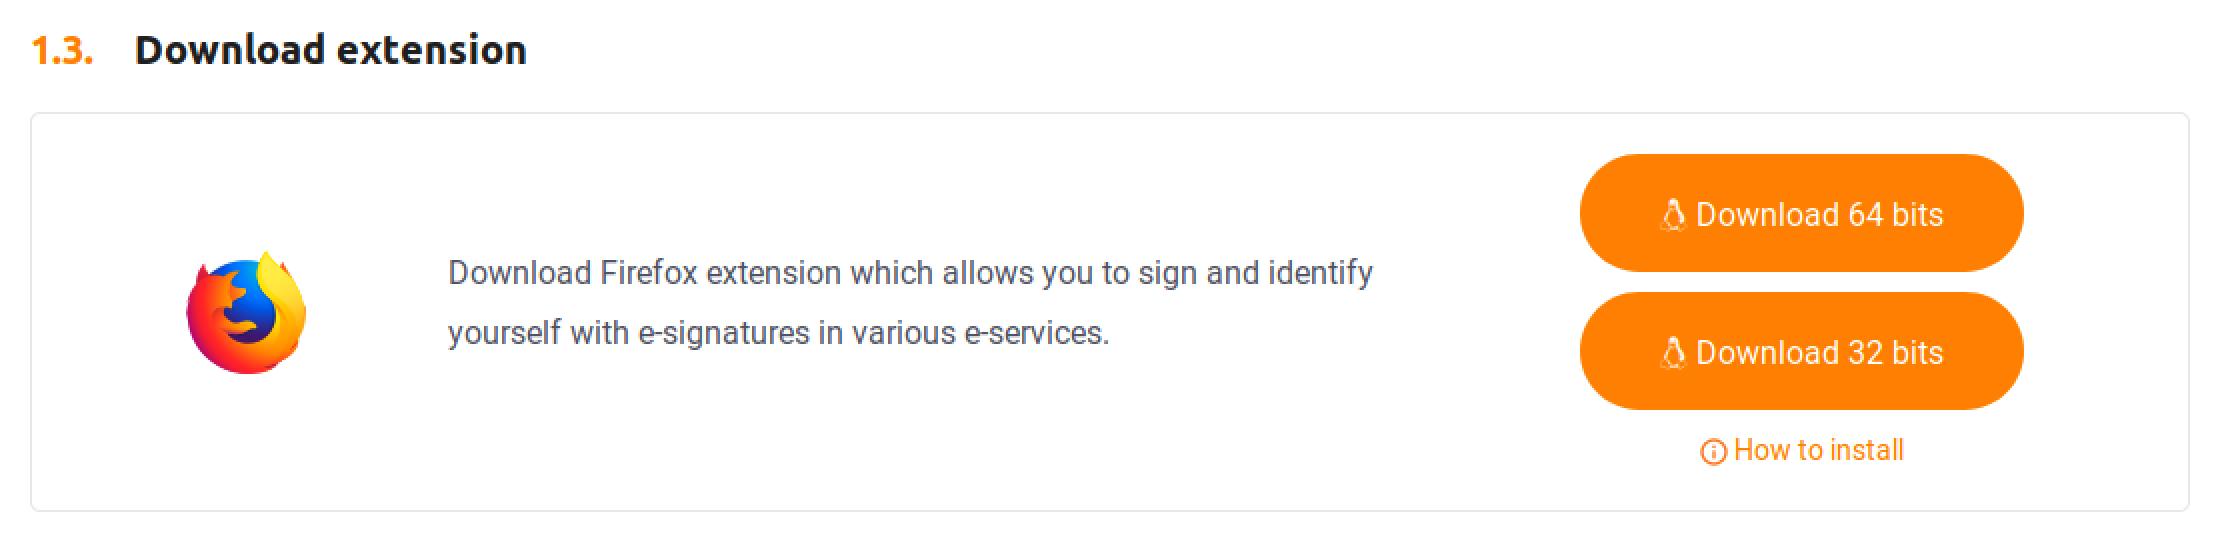 Mozilla Firefox extension and e-signature device drivers